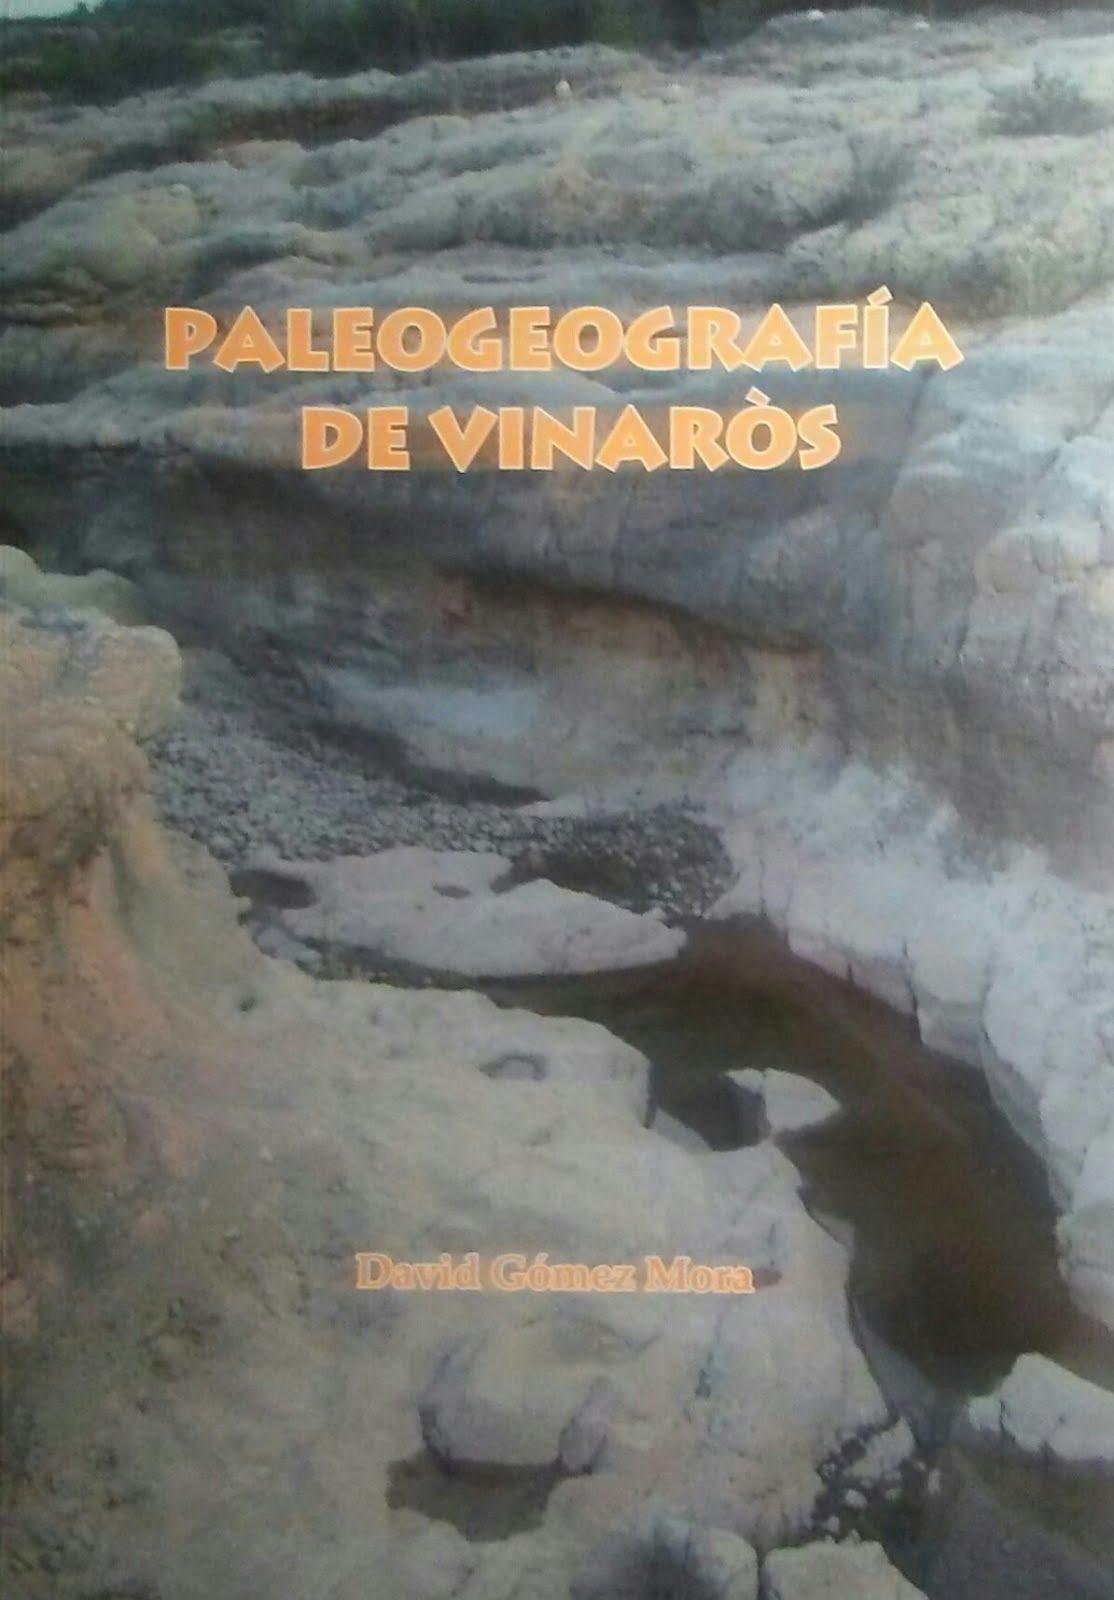 Paleogeografía de Vinaròs (2007)